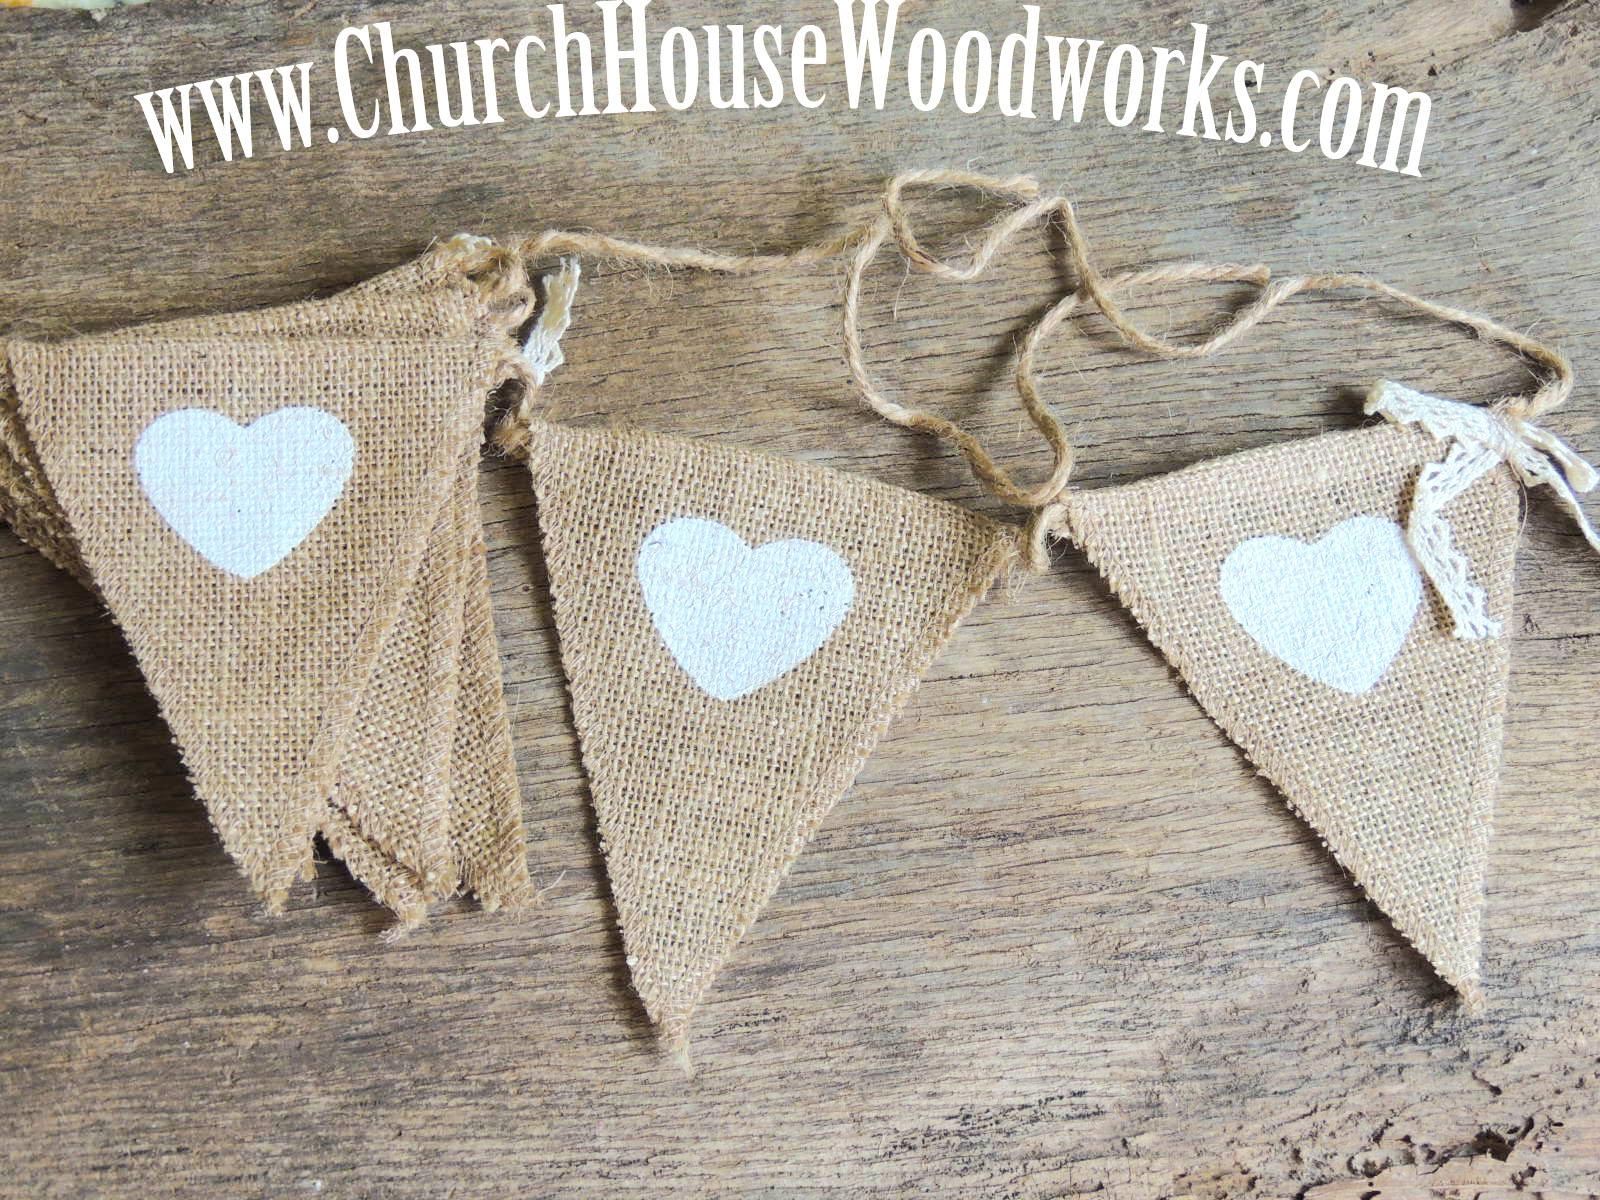 Heart Burlap Flag Banner For Rustic Weddings Baby Showers Birthdays Church House Woodworks DIY Decorating